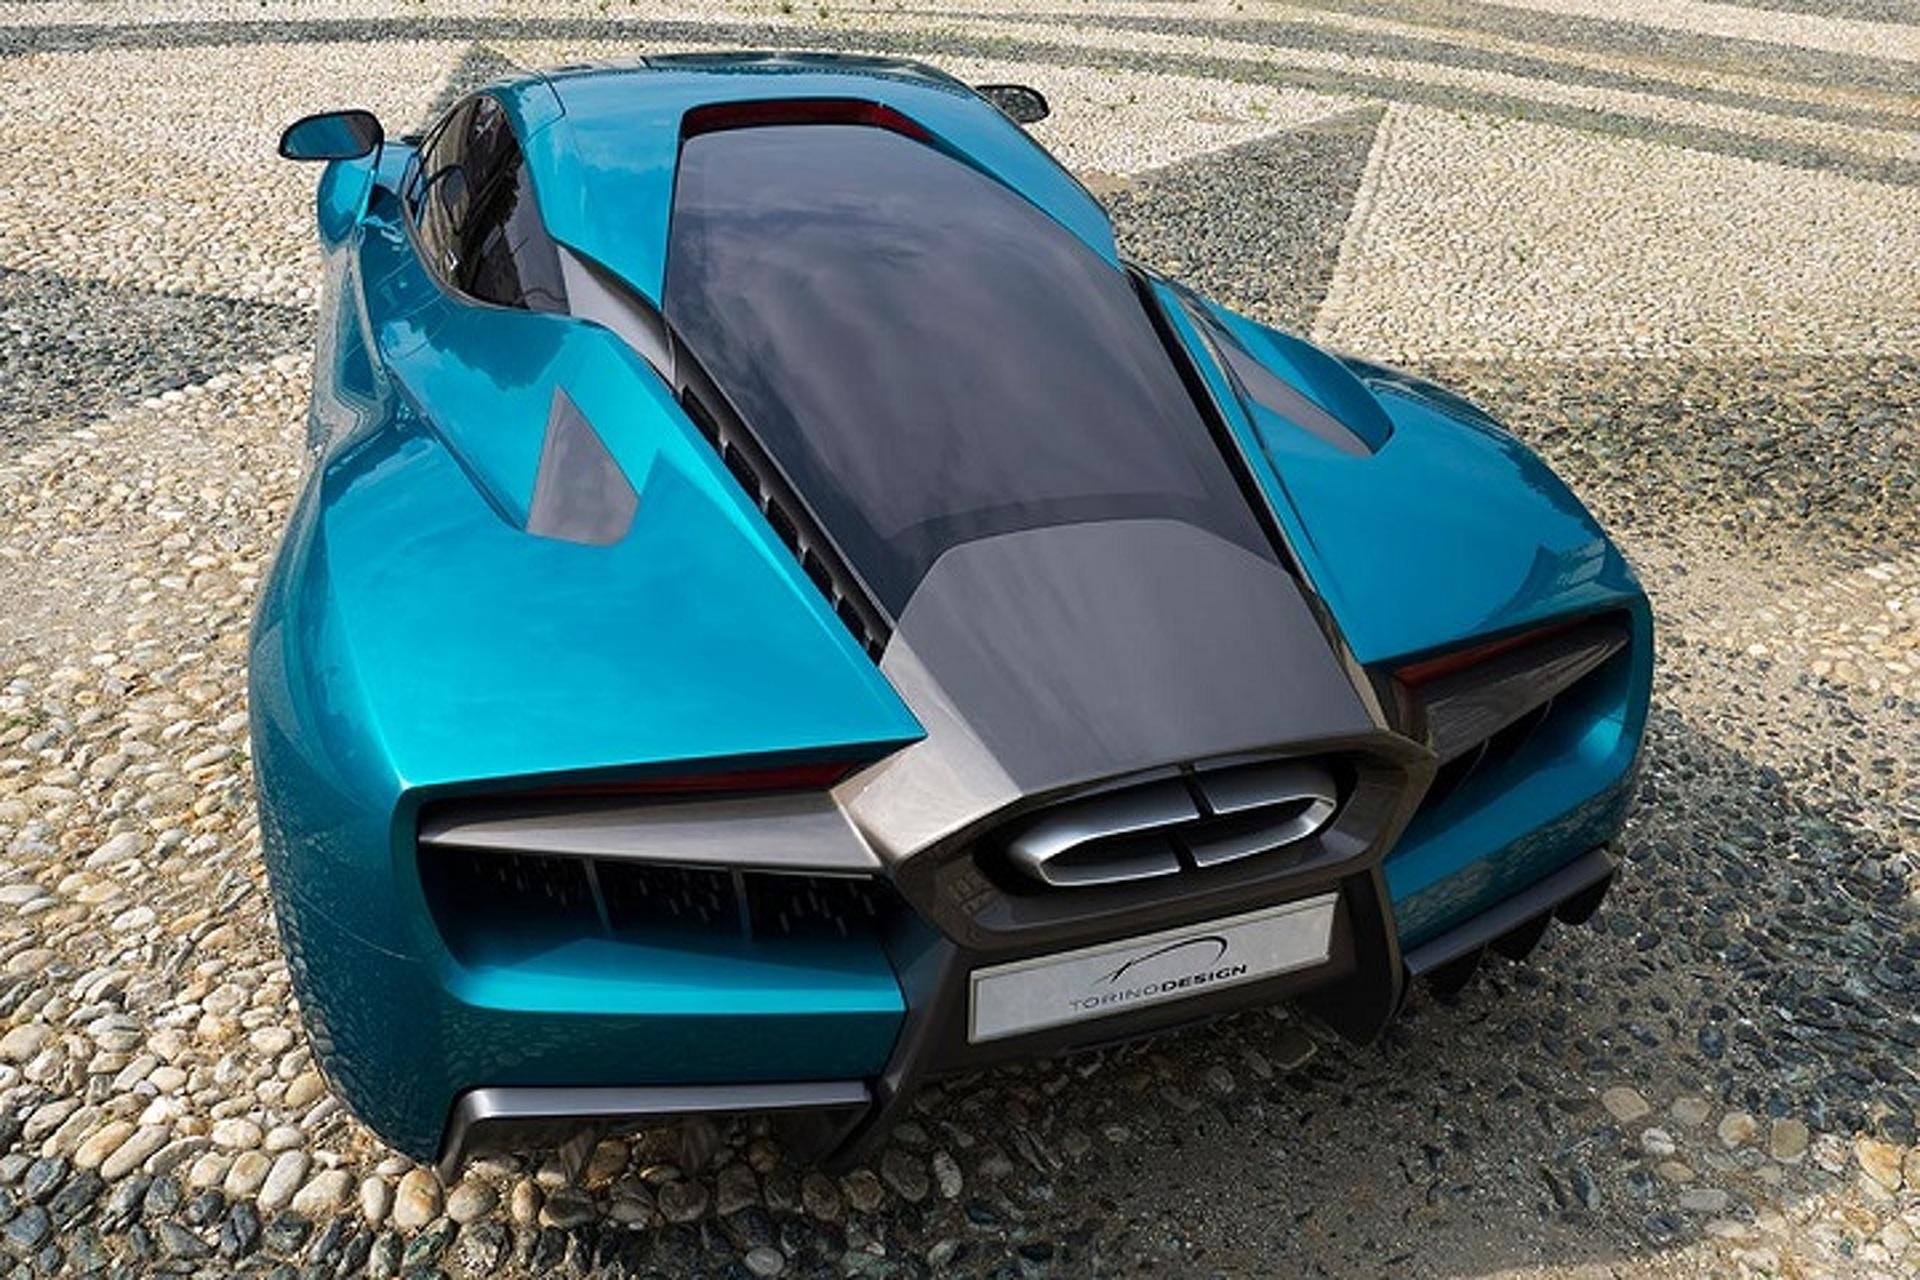 The Torino Design ATS Wildtwelve is an 860HP Hybrid Hypercar